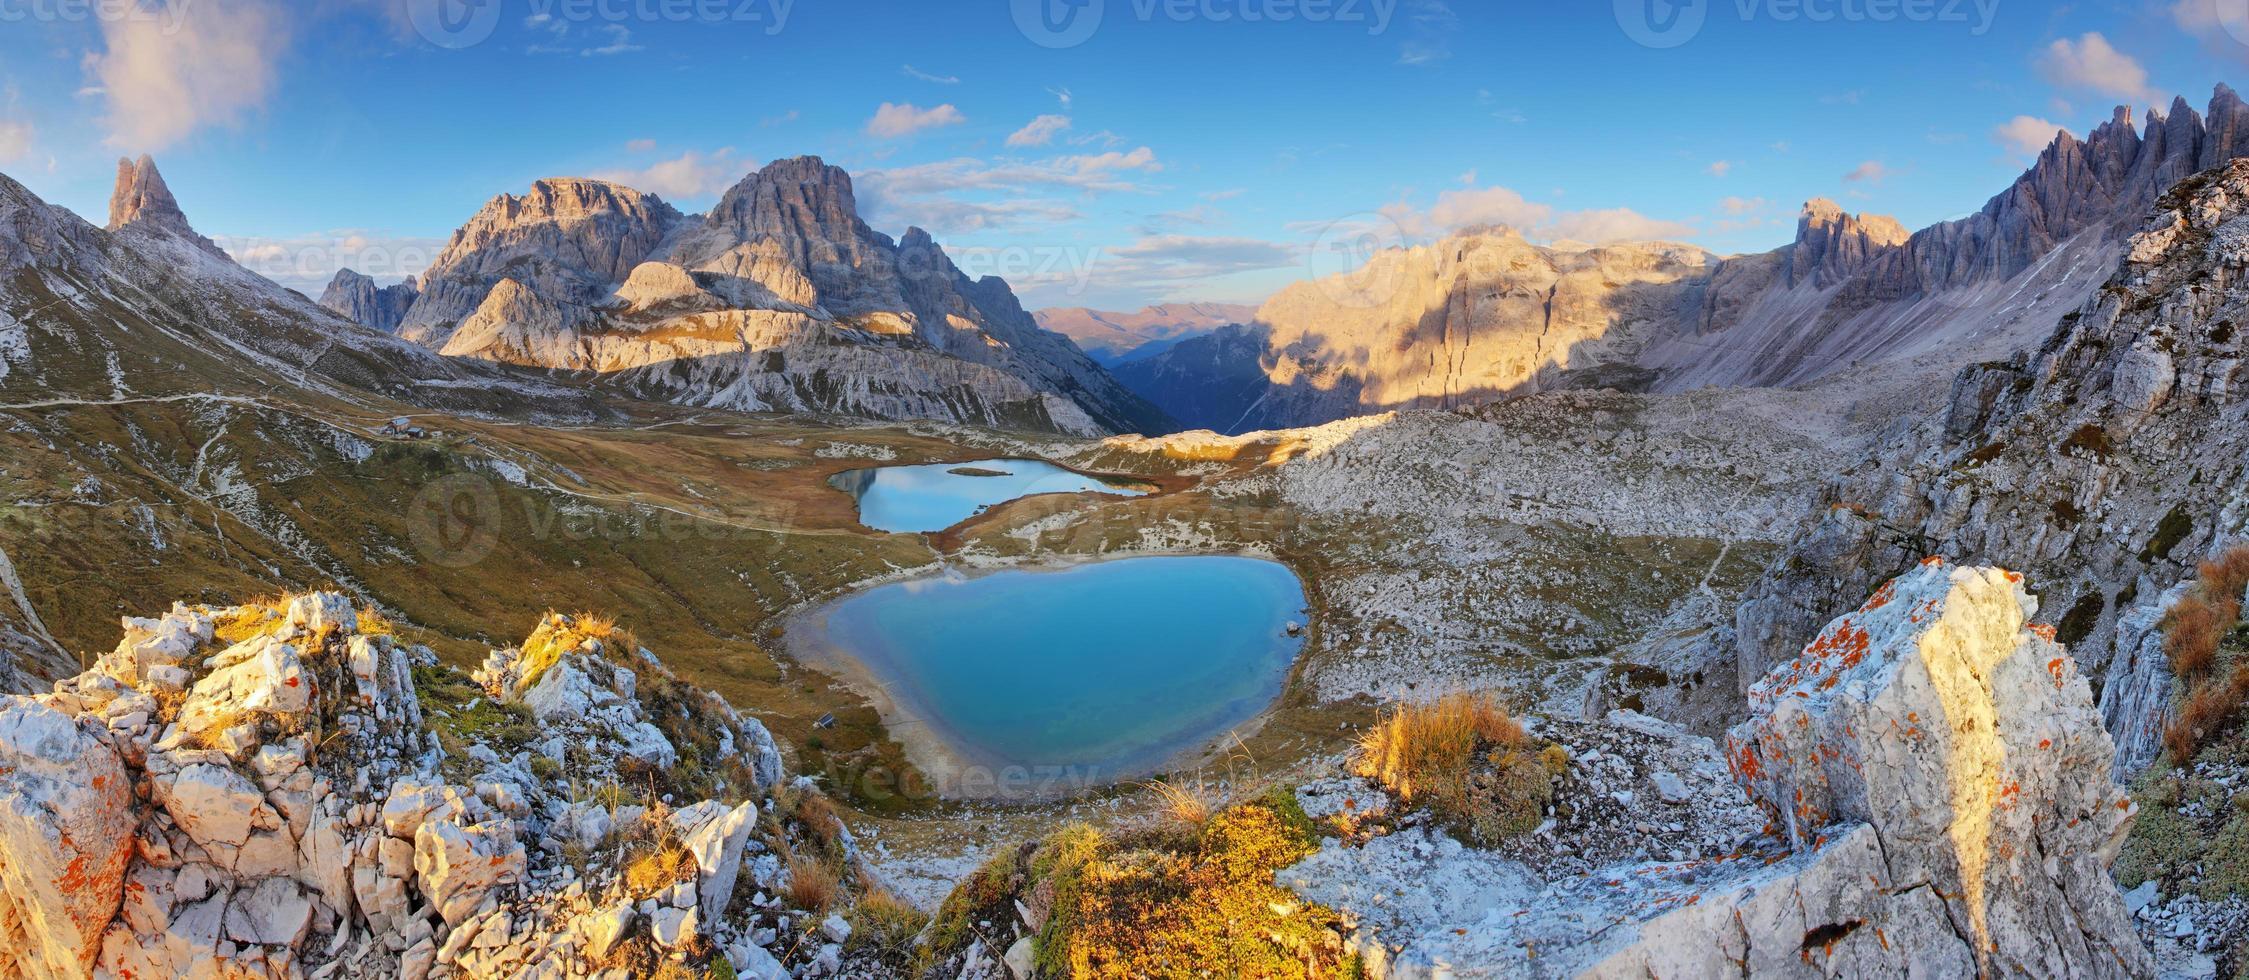 lago dei piani - montagne italie dolomiti panorama photo